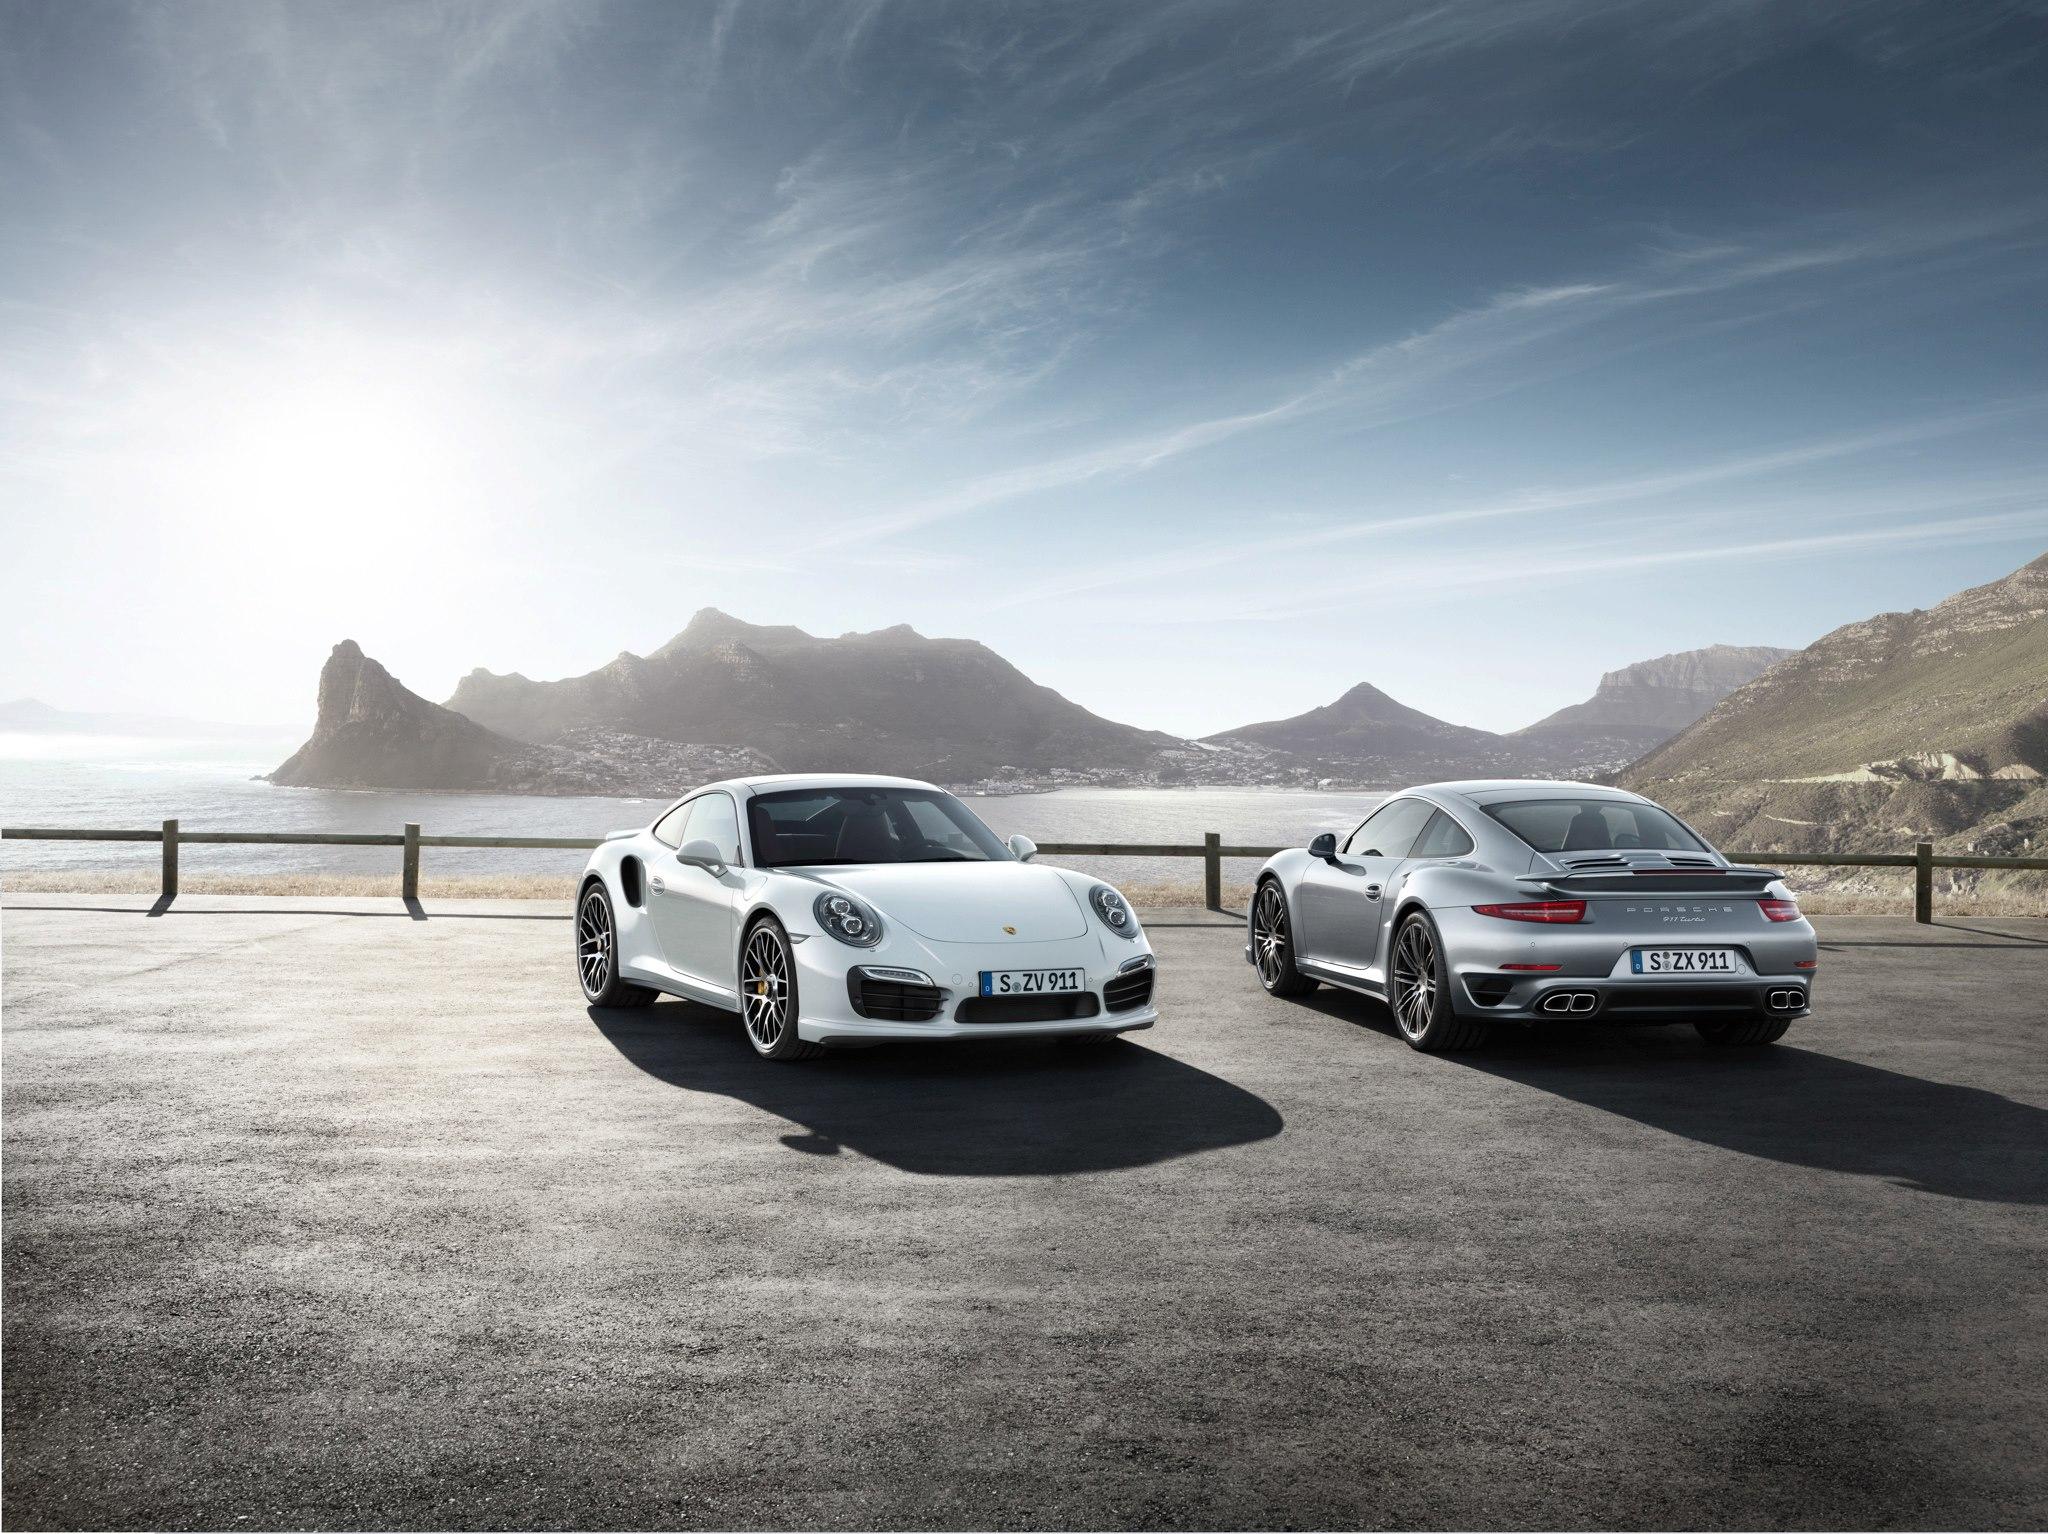 Porsche 911 Turbo Wallpaper for Pinterest 2048x1534